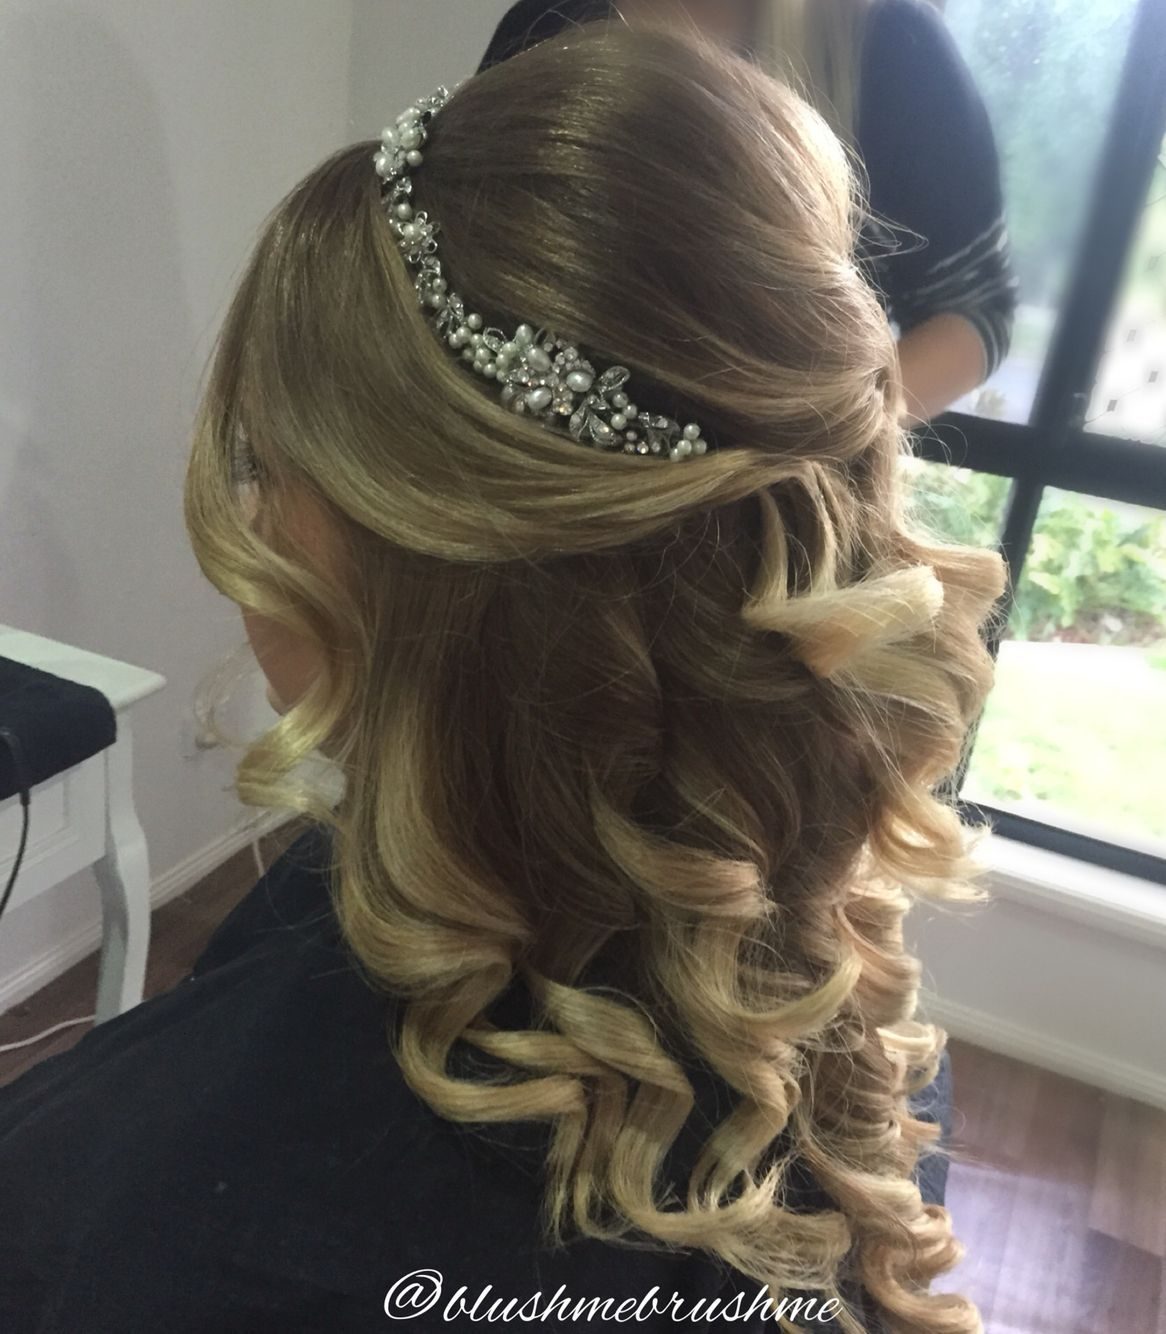 Half Up Half Down Hairstyle With Curls Headband Done By Myself Weddinghairshort Hair Down Styles Beautiful Wedding Hair Bridal Hair Half Up